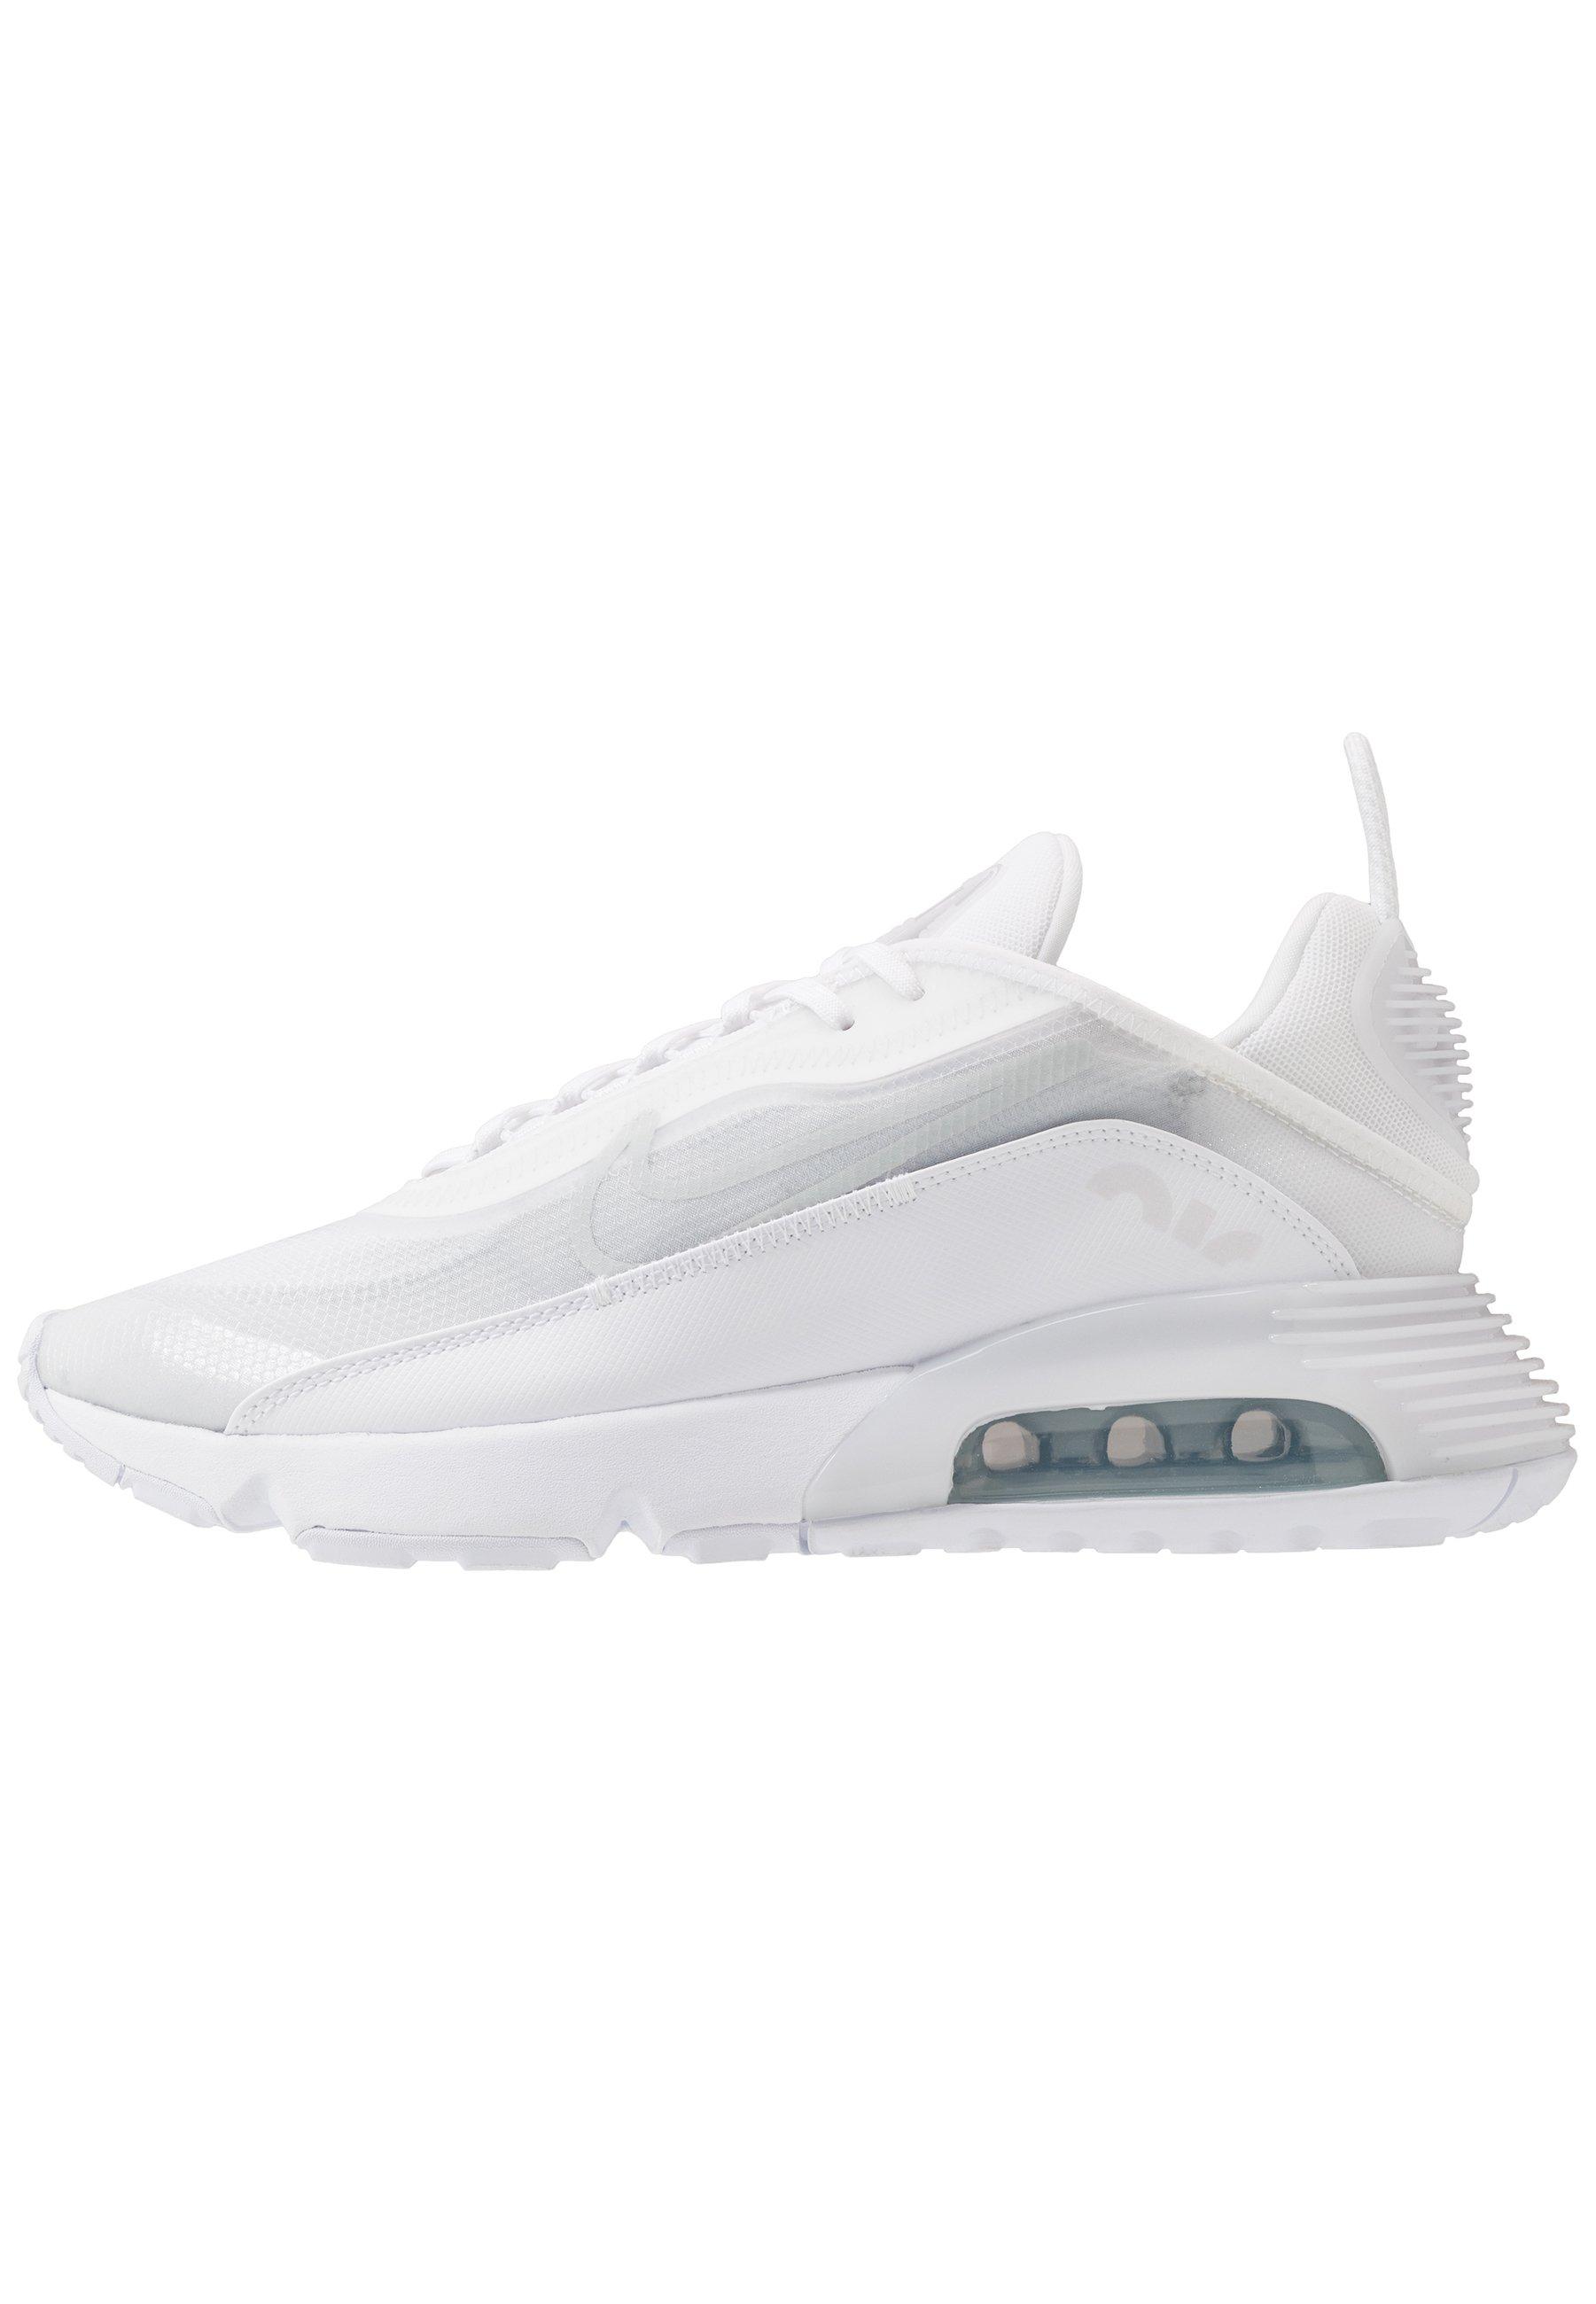 AIR MAX 2090 Sneakers basse whiteblackwolf greypure platinumreflect silver